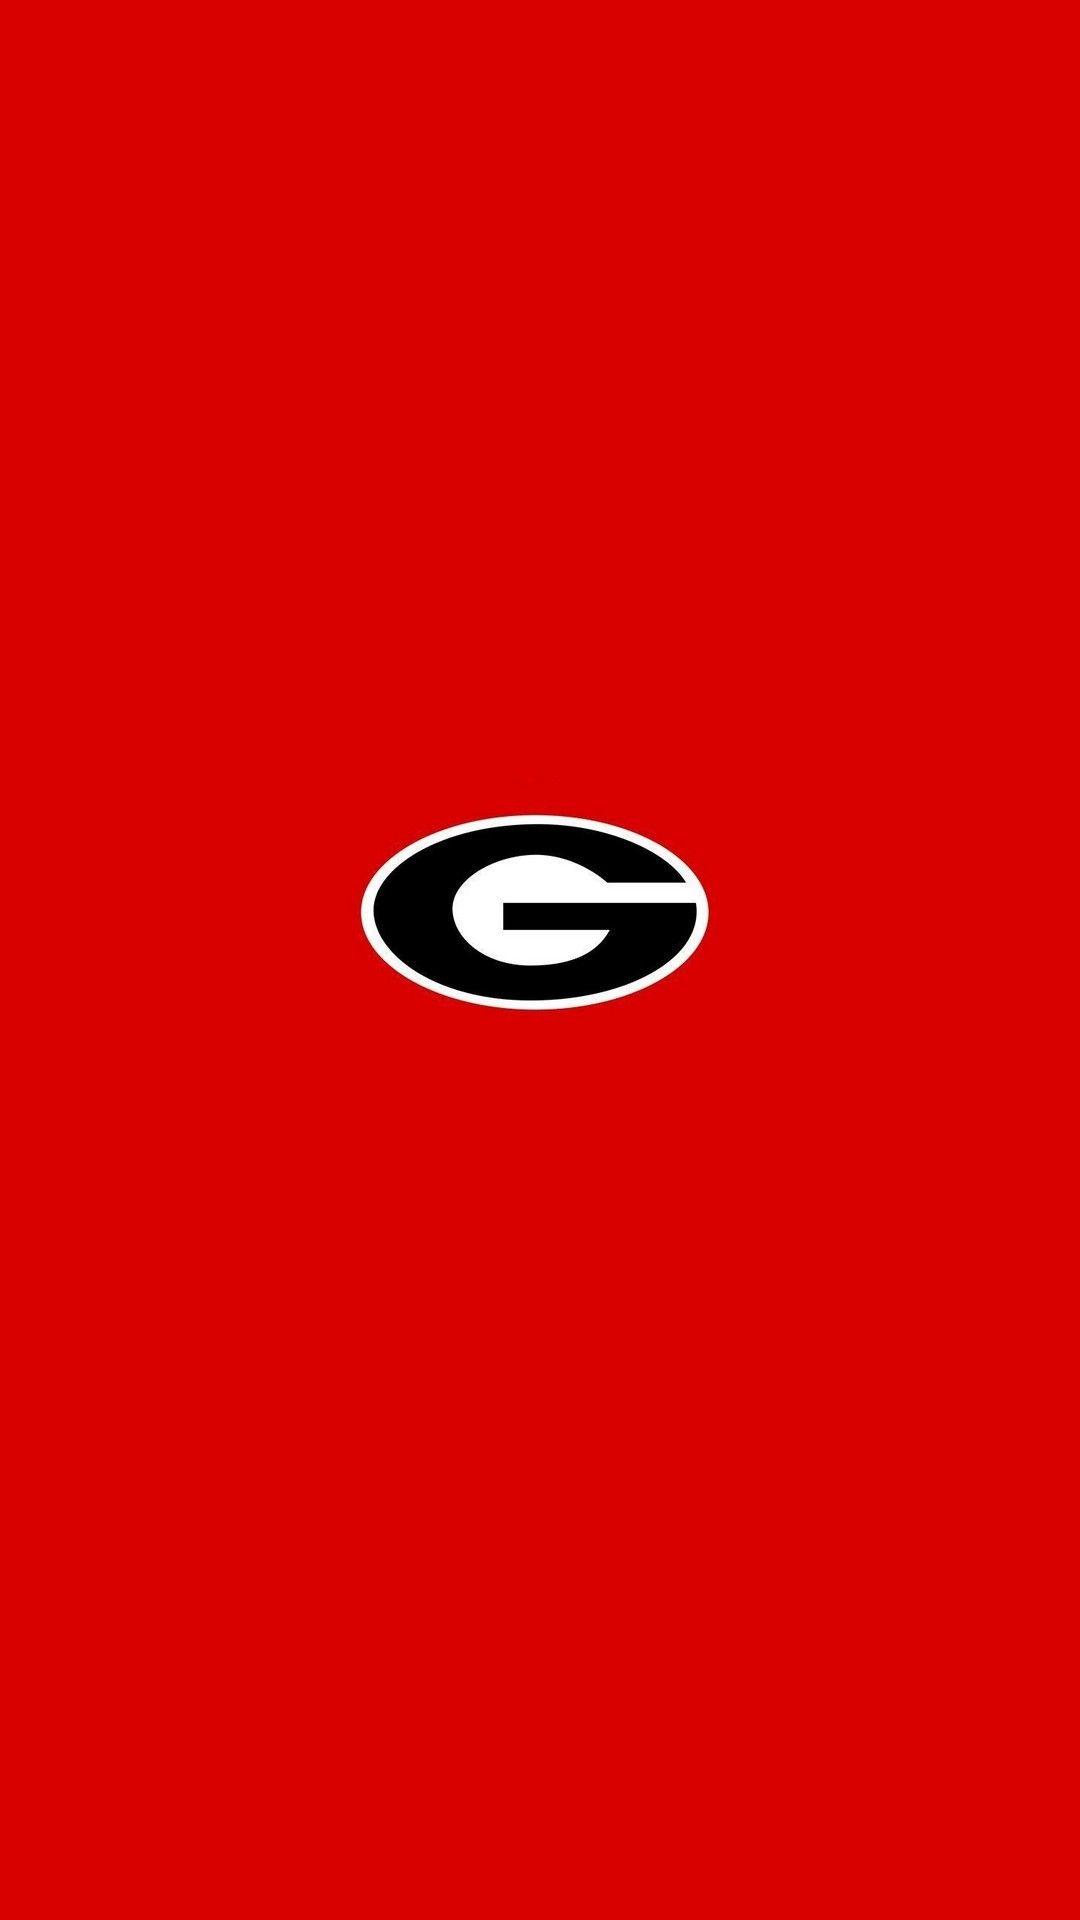 Wallpaper Georgia Bulldogs For Iphone Best Iphone Wallpaper Georgia Bulldogs Bulldog Wallpaper Georgia Dawgs